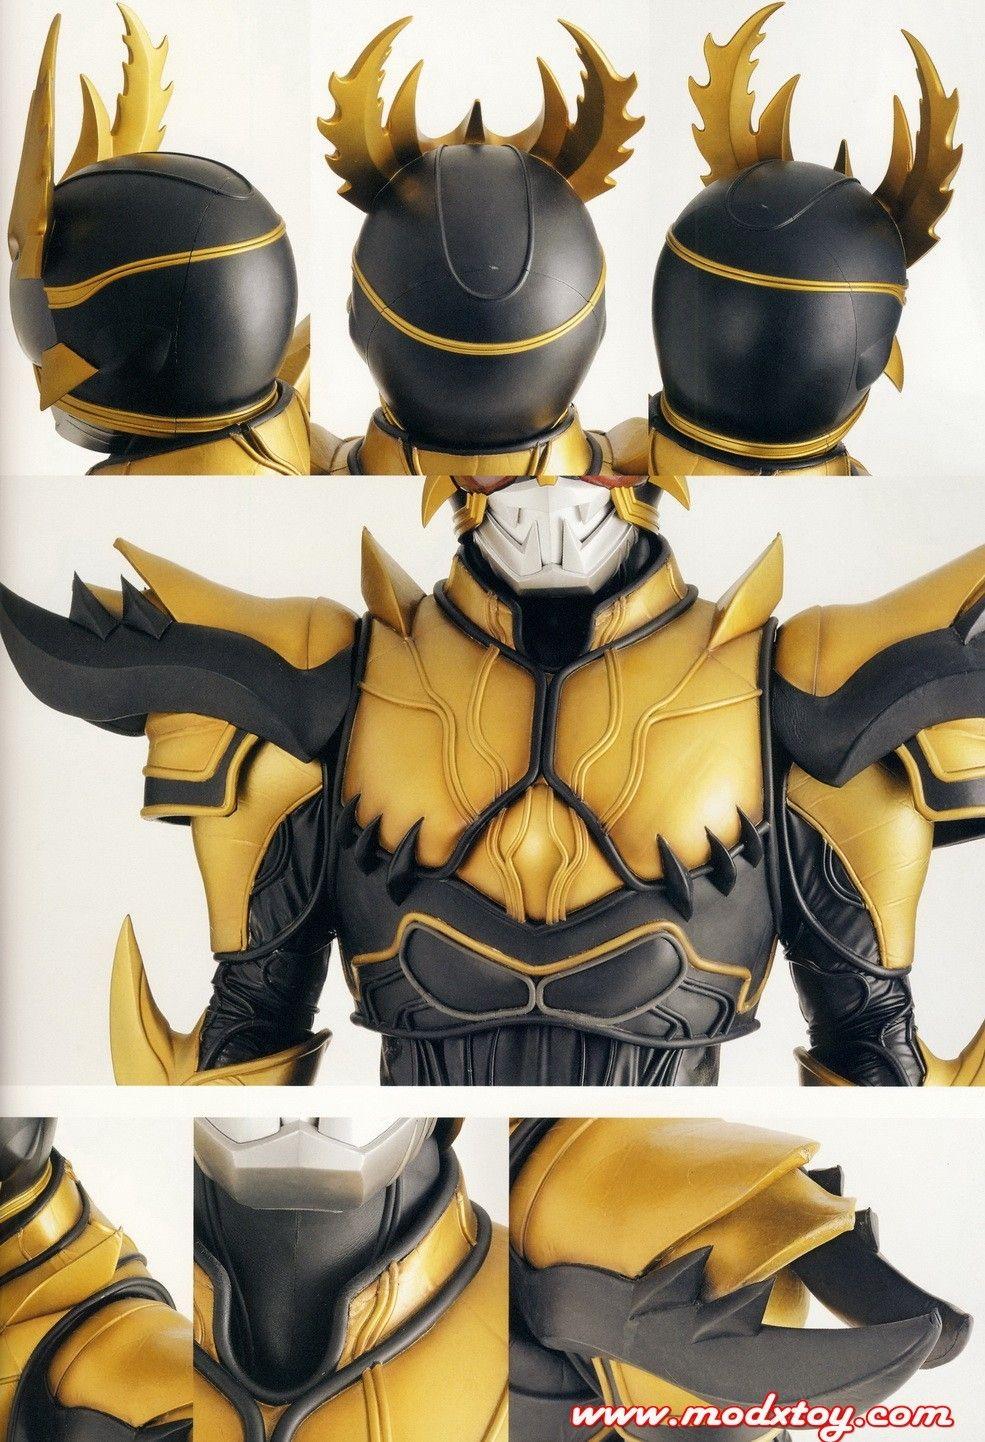 「Kamen Rider Kuuga Rising Ultimate form」おしゃれまとめの人気アイデア